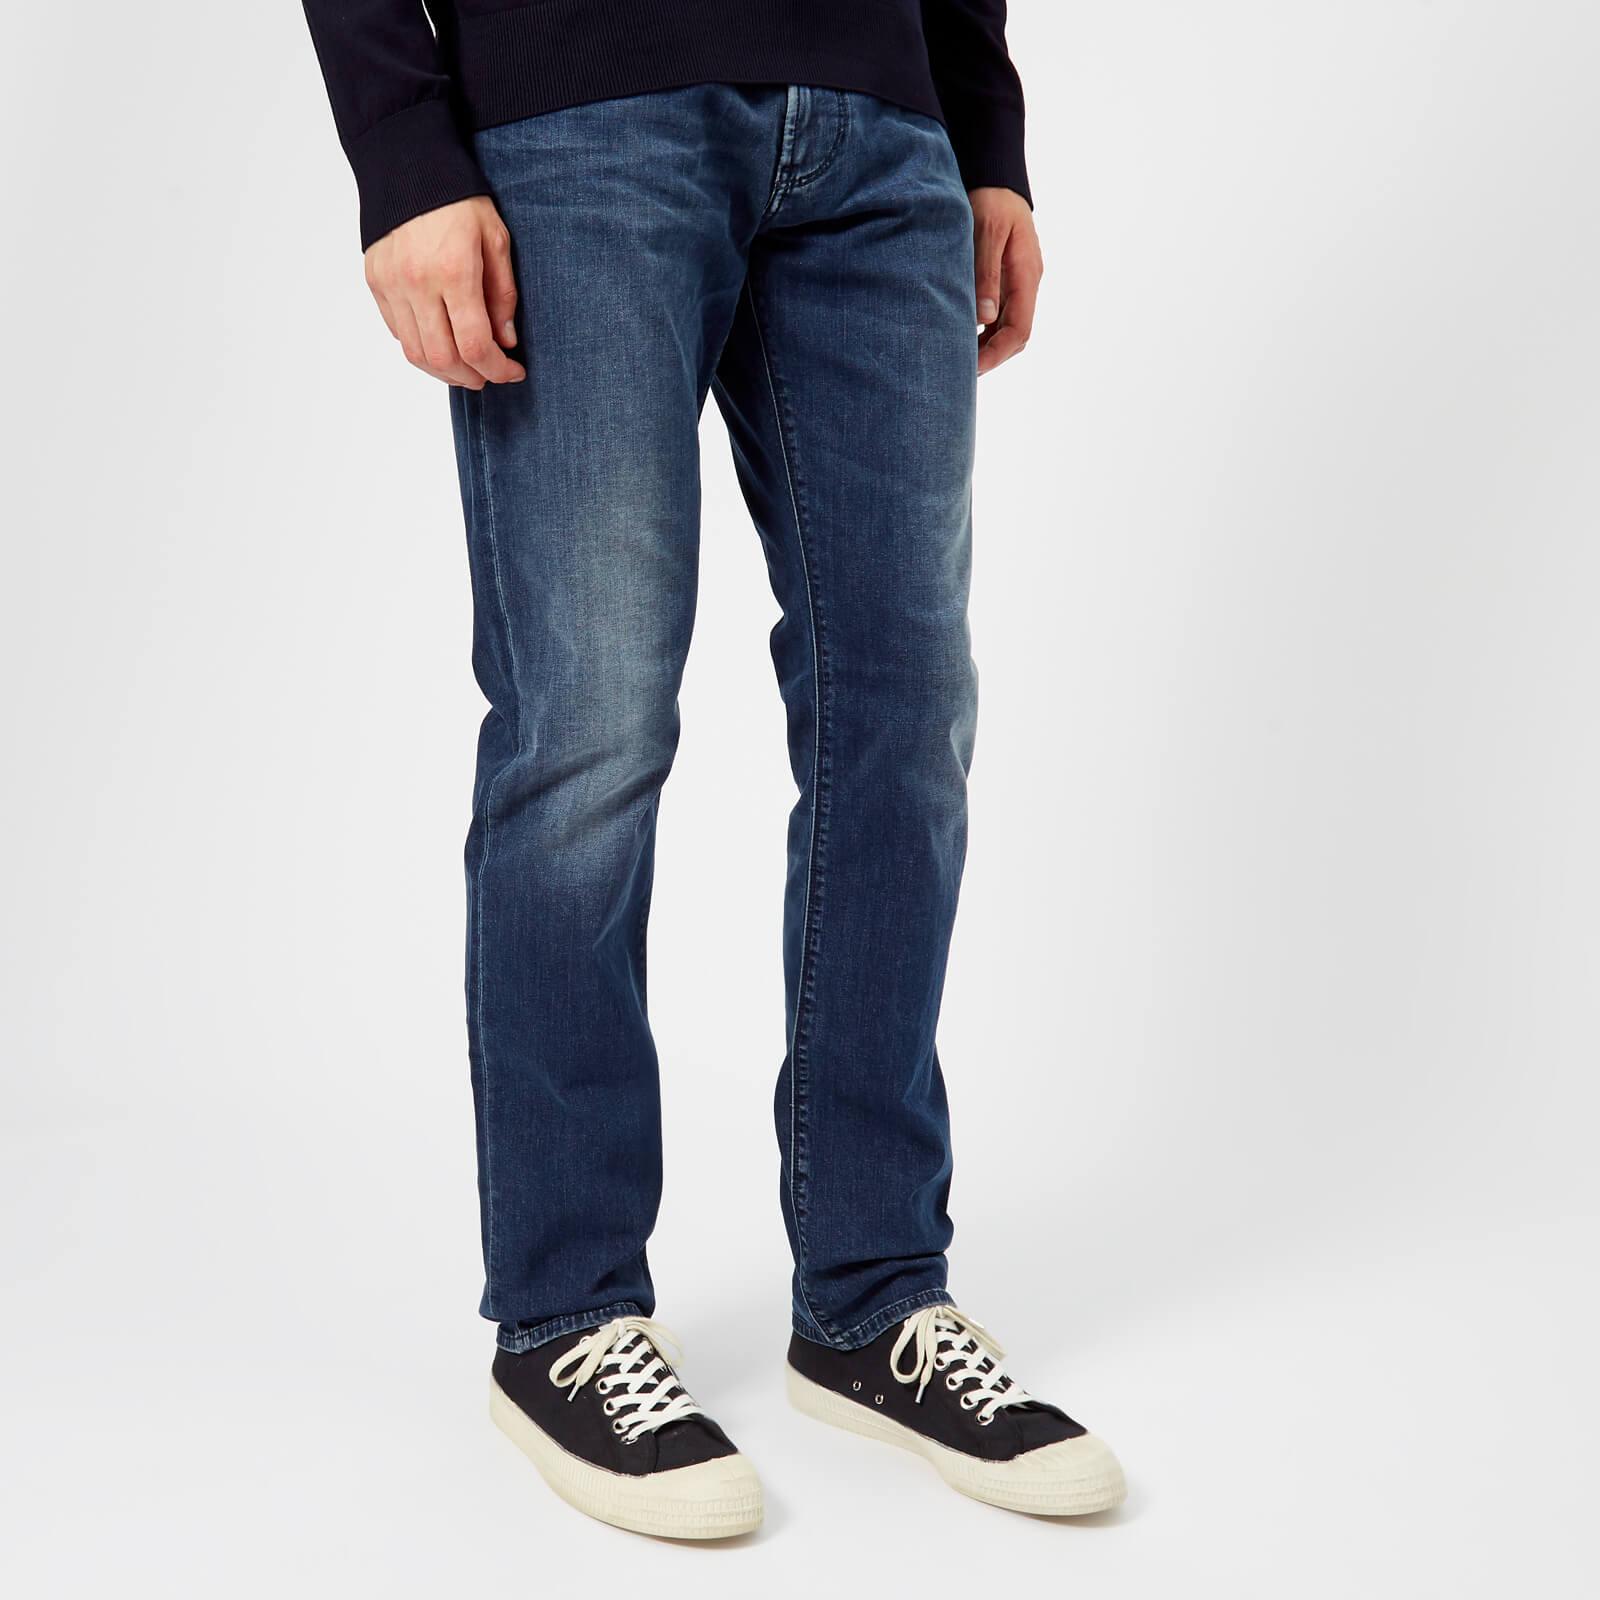 wholesale dealer official shop hot products Emporio Armani Men's 5 Pocket Slim Denim Jeans - Denim Blue MD